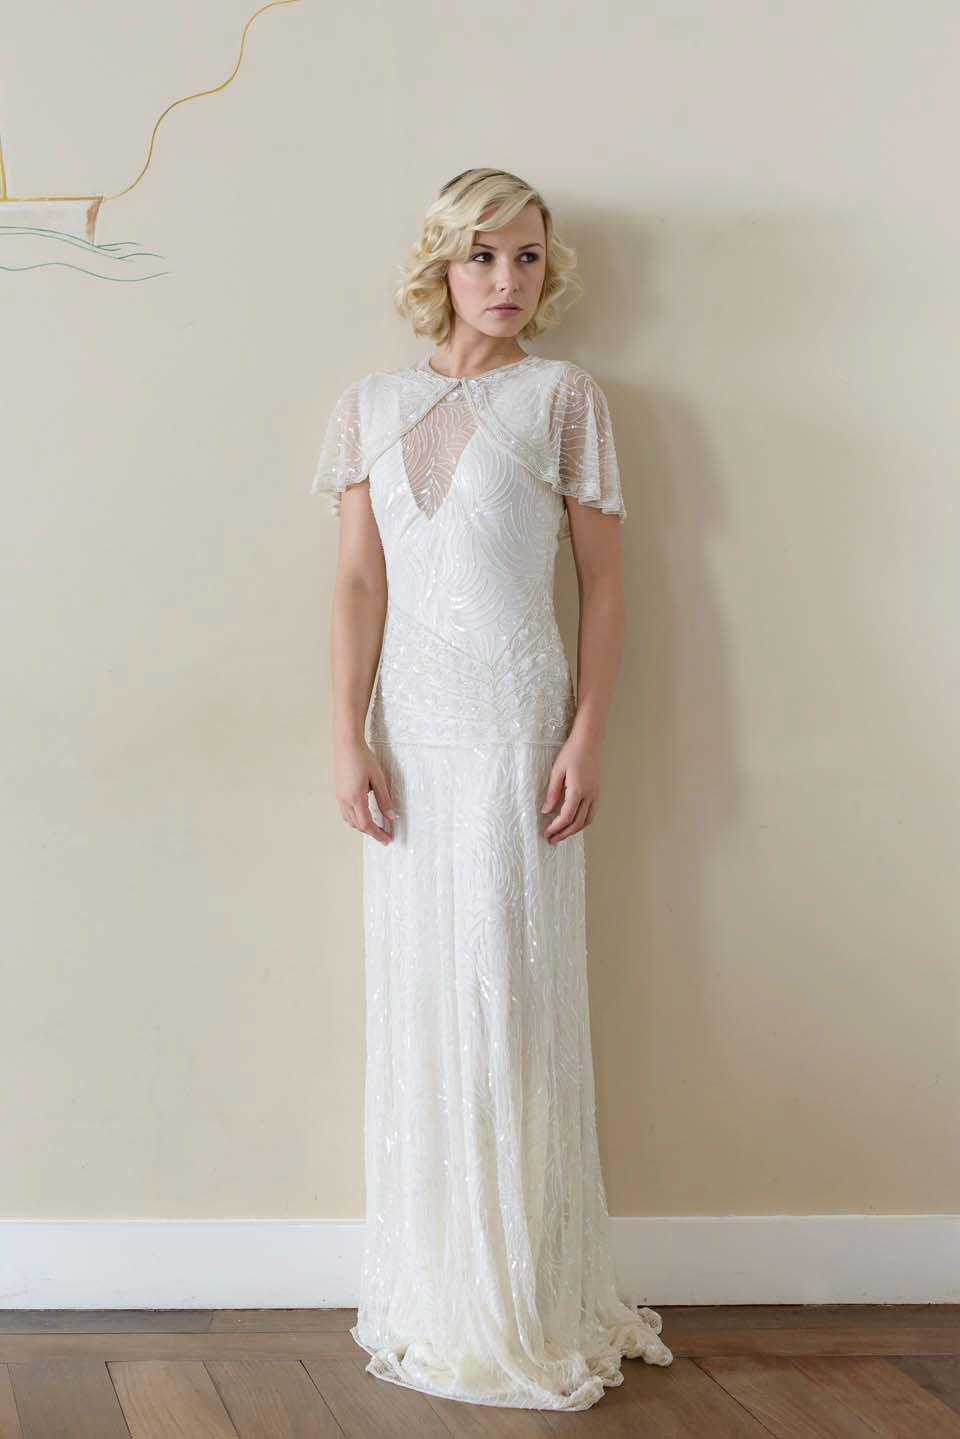 1930s wedding dress  Pin by jooana on wedding ideas for you  Pinterest  Wedding dresses